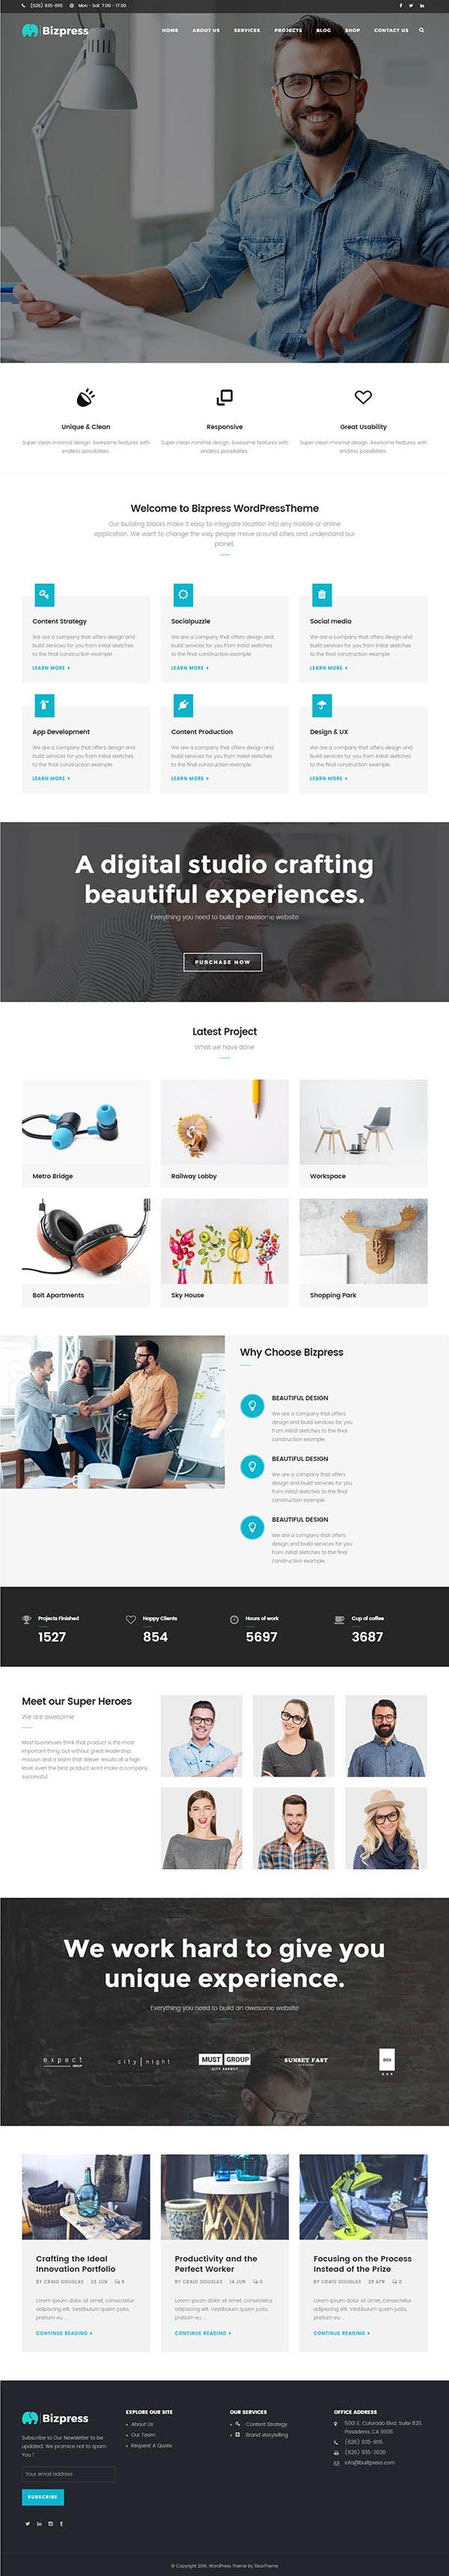 BizPress : Business & Corporate WordPress Theme